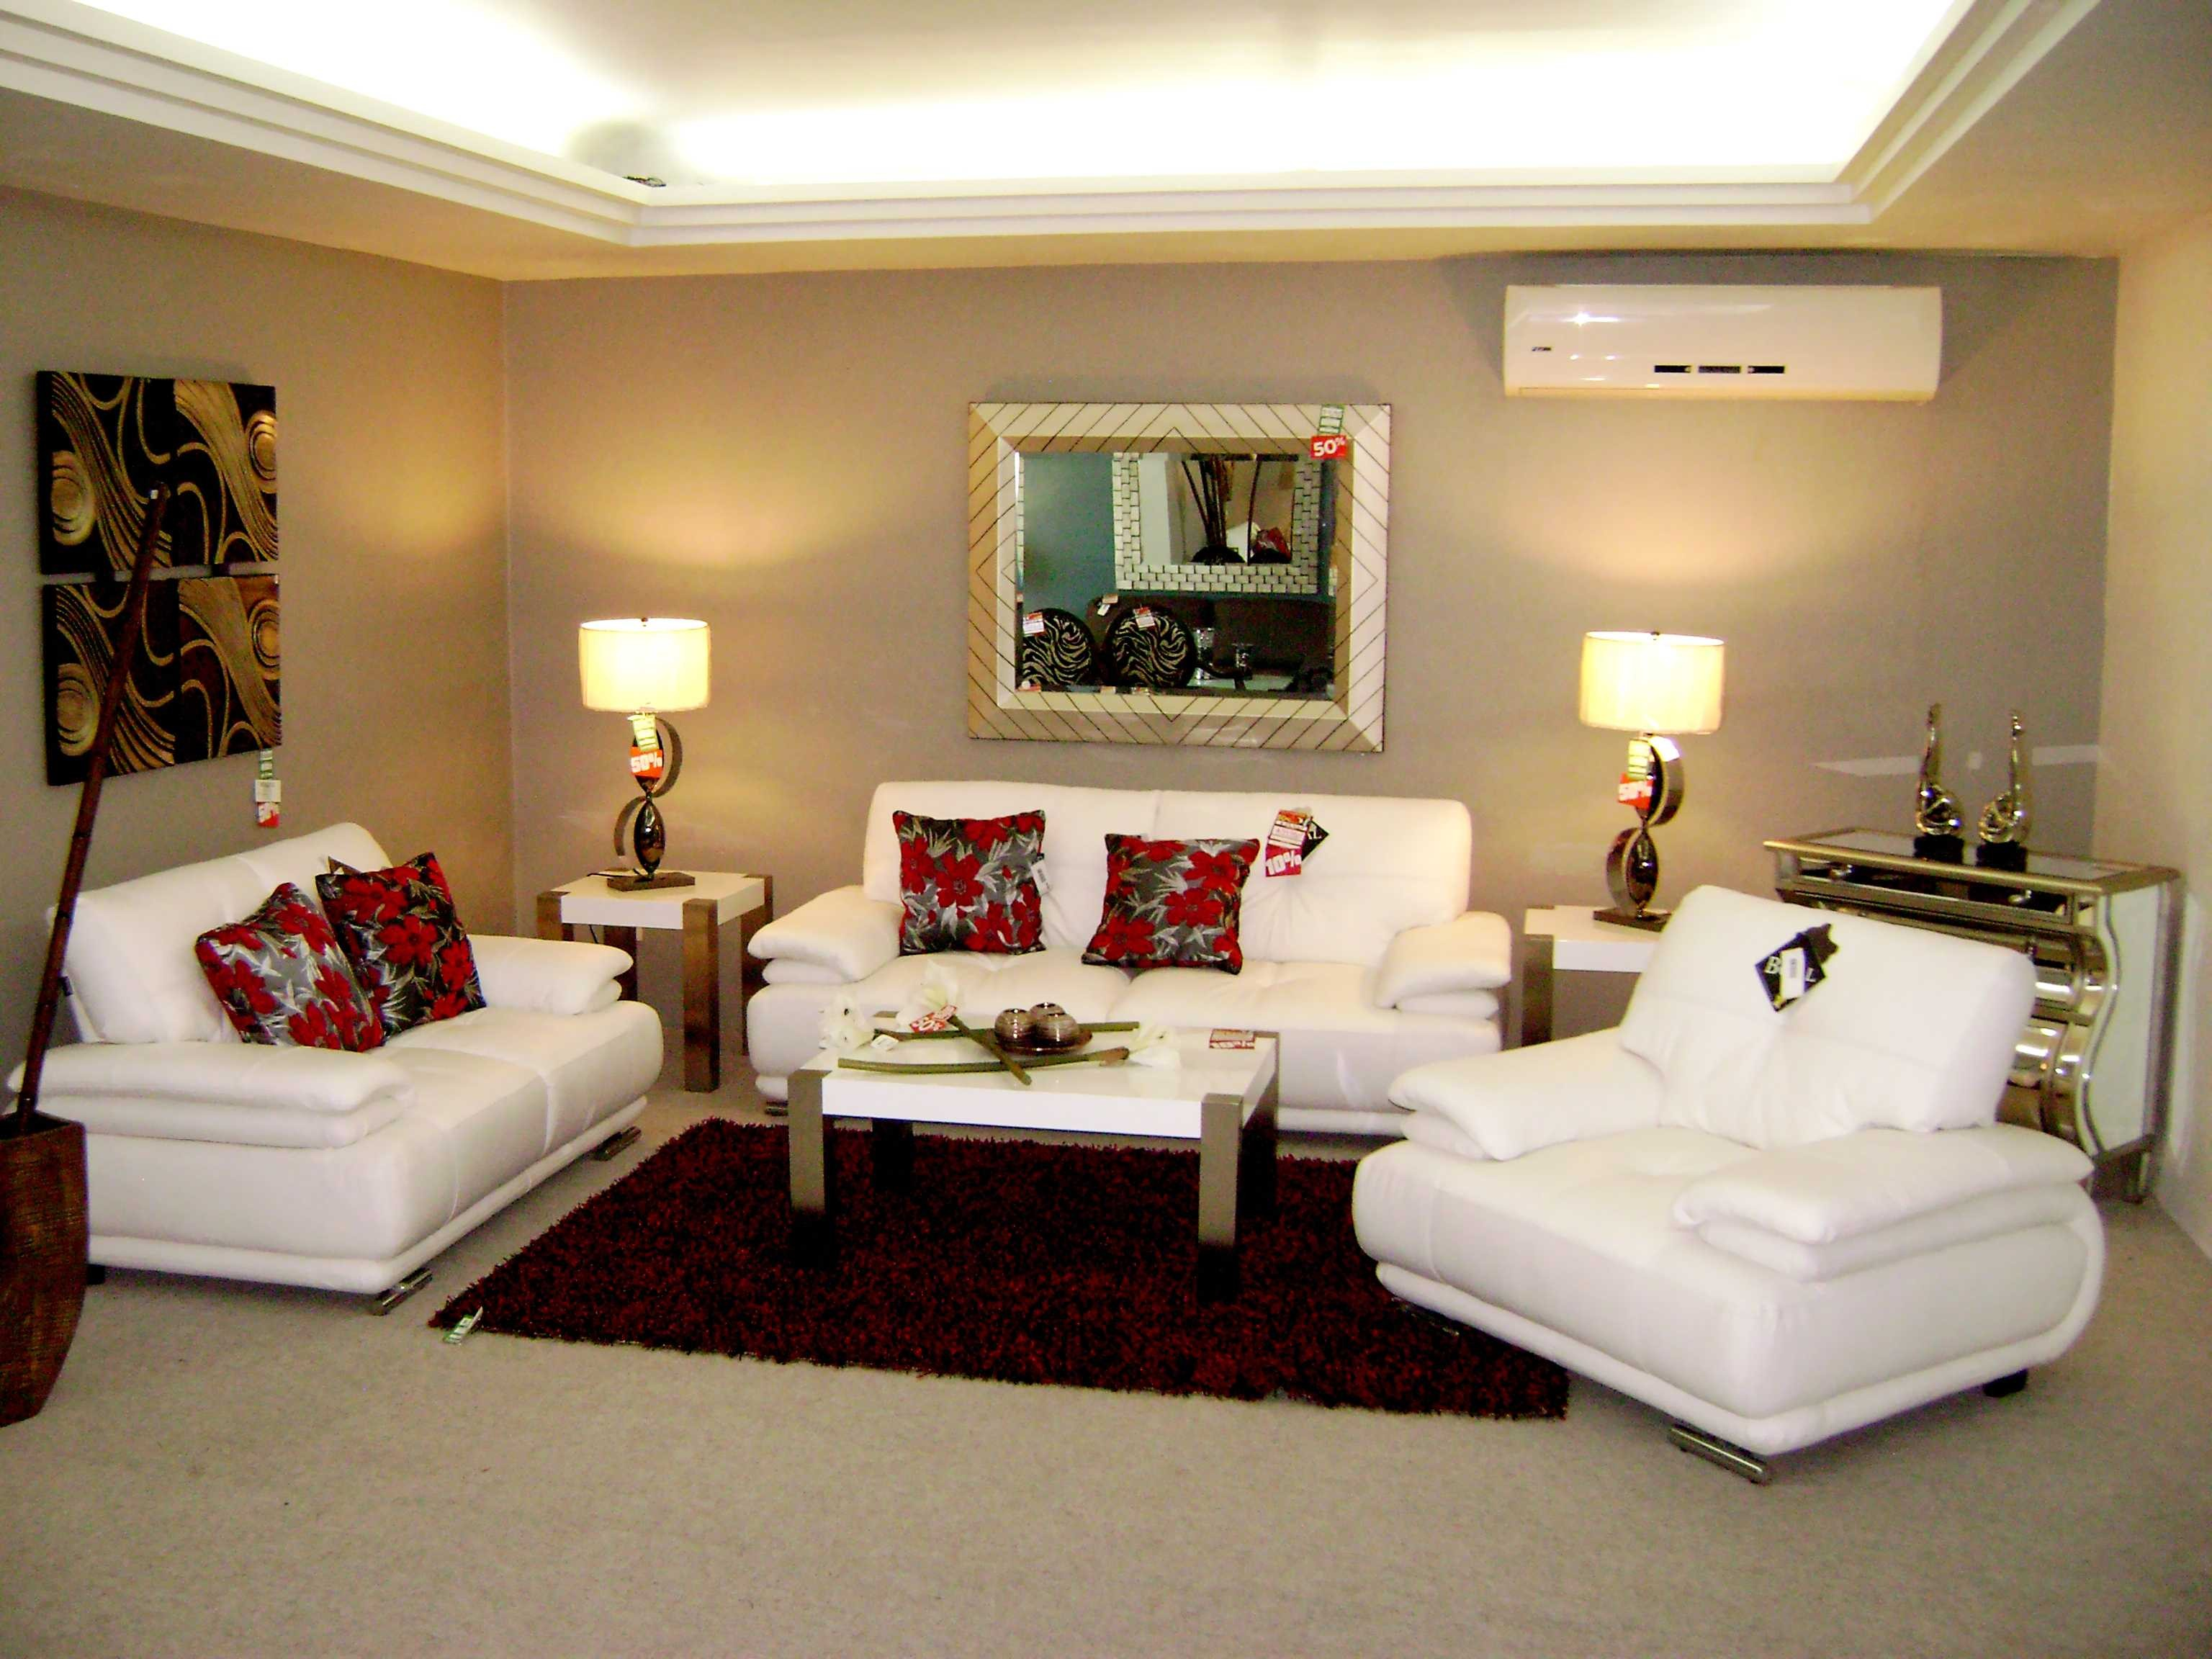 Interiores for Software para decoracion de interiores